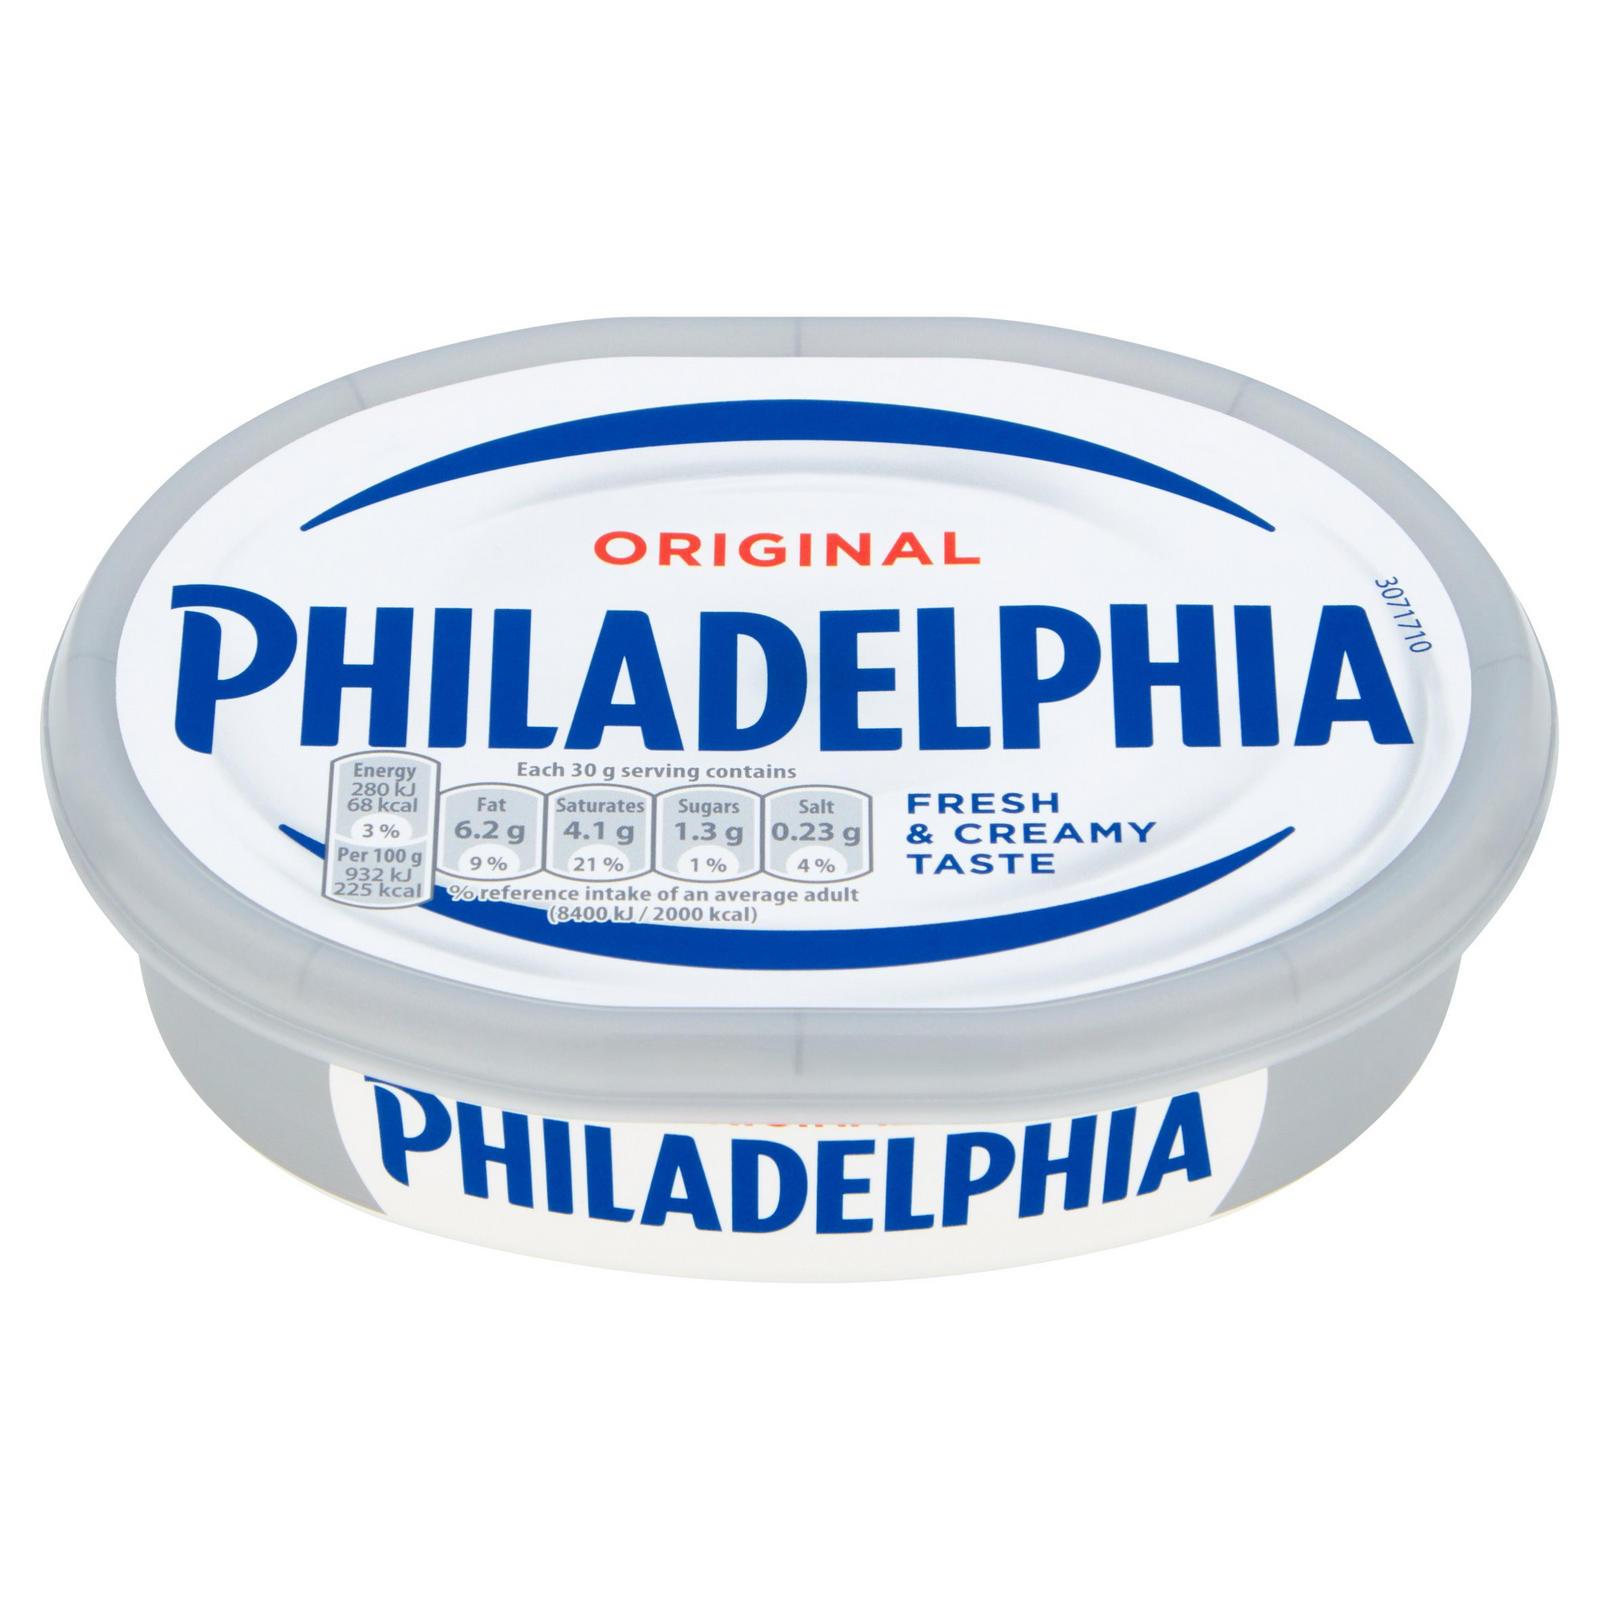 Miraculous Philadelphia Original Soft White Cheese 180G Cottage Download Free Architecture Designs Scobabritishbridgeorg